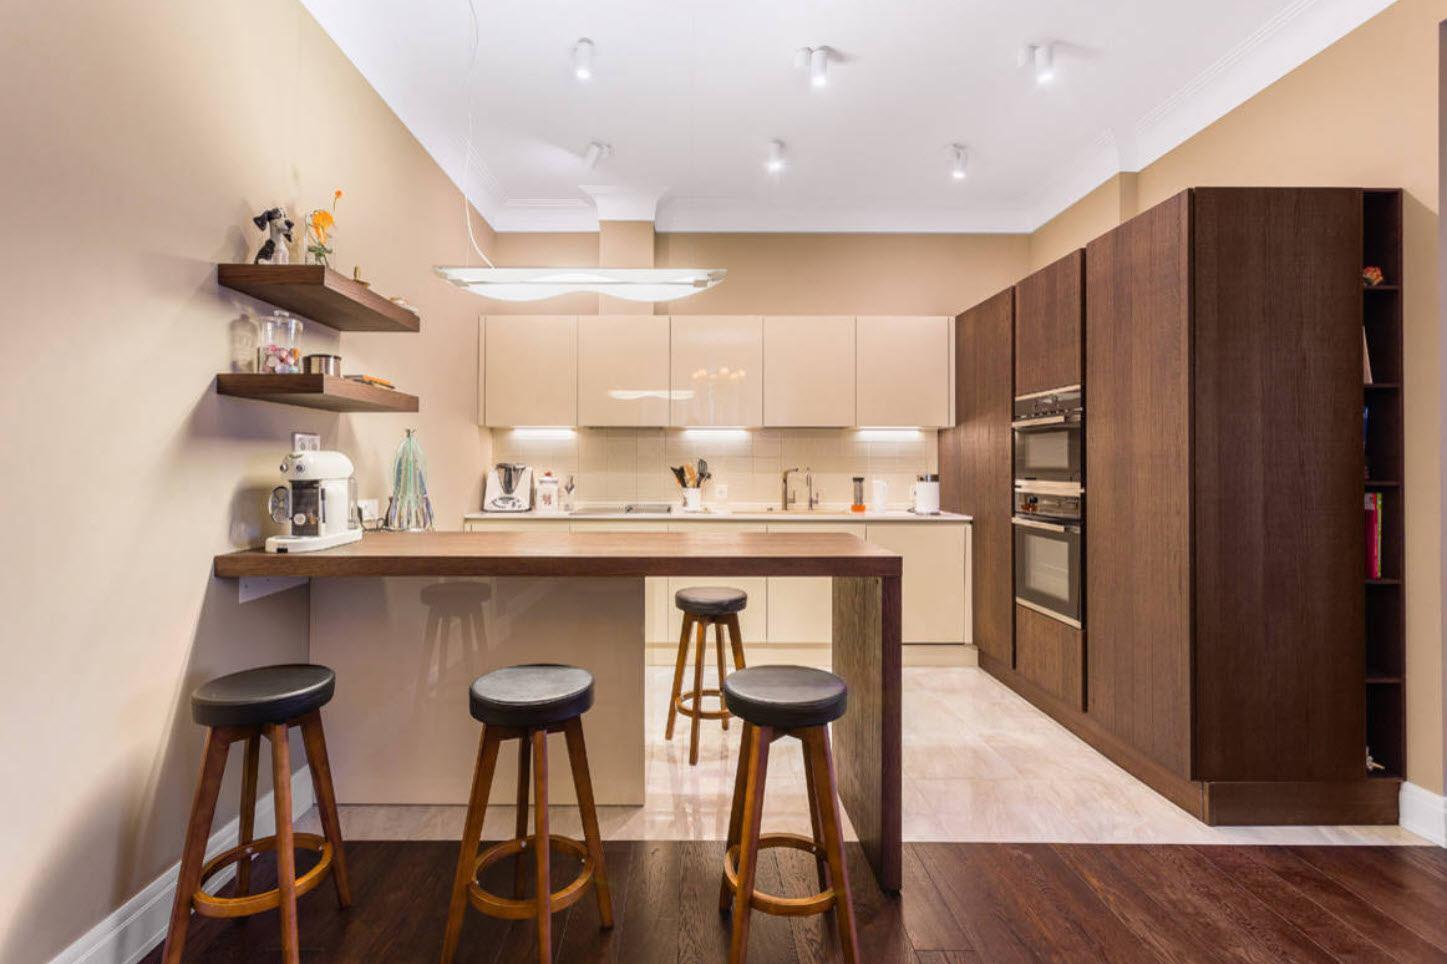 Noble dark hard wood color for splendid modern kitchen space